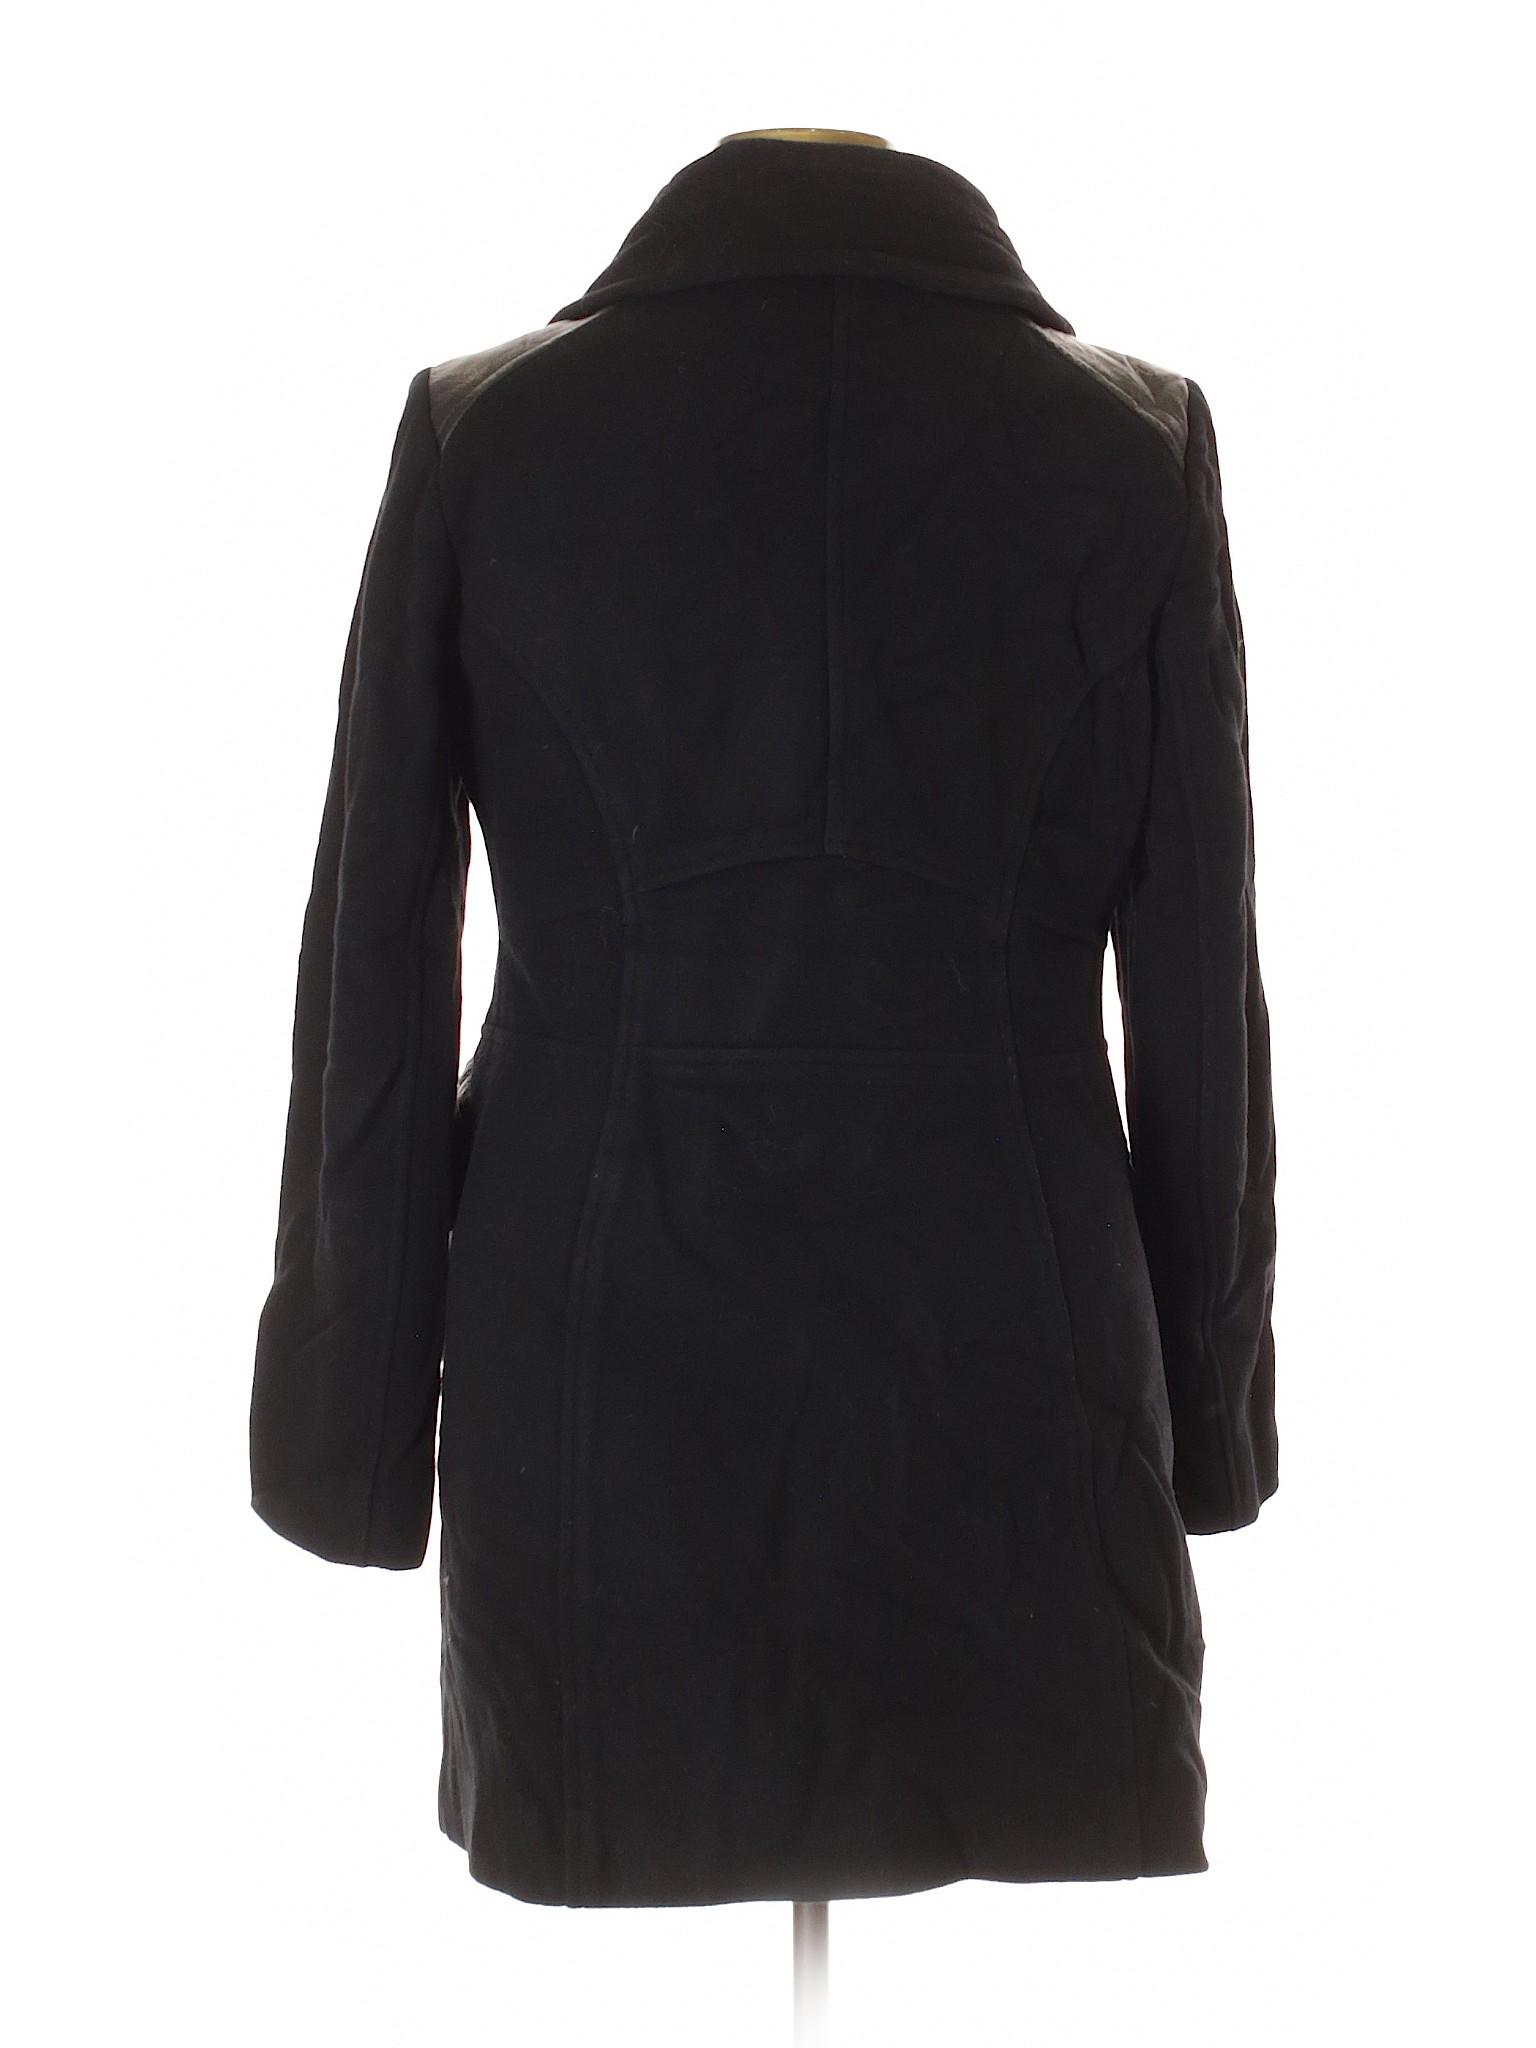 Haan Boutique Coat Wool Cole leisure zCwCq6